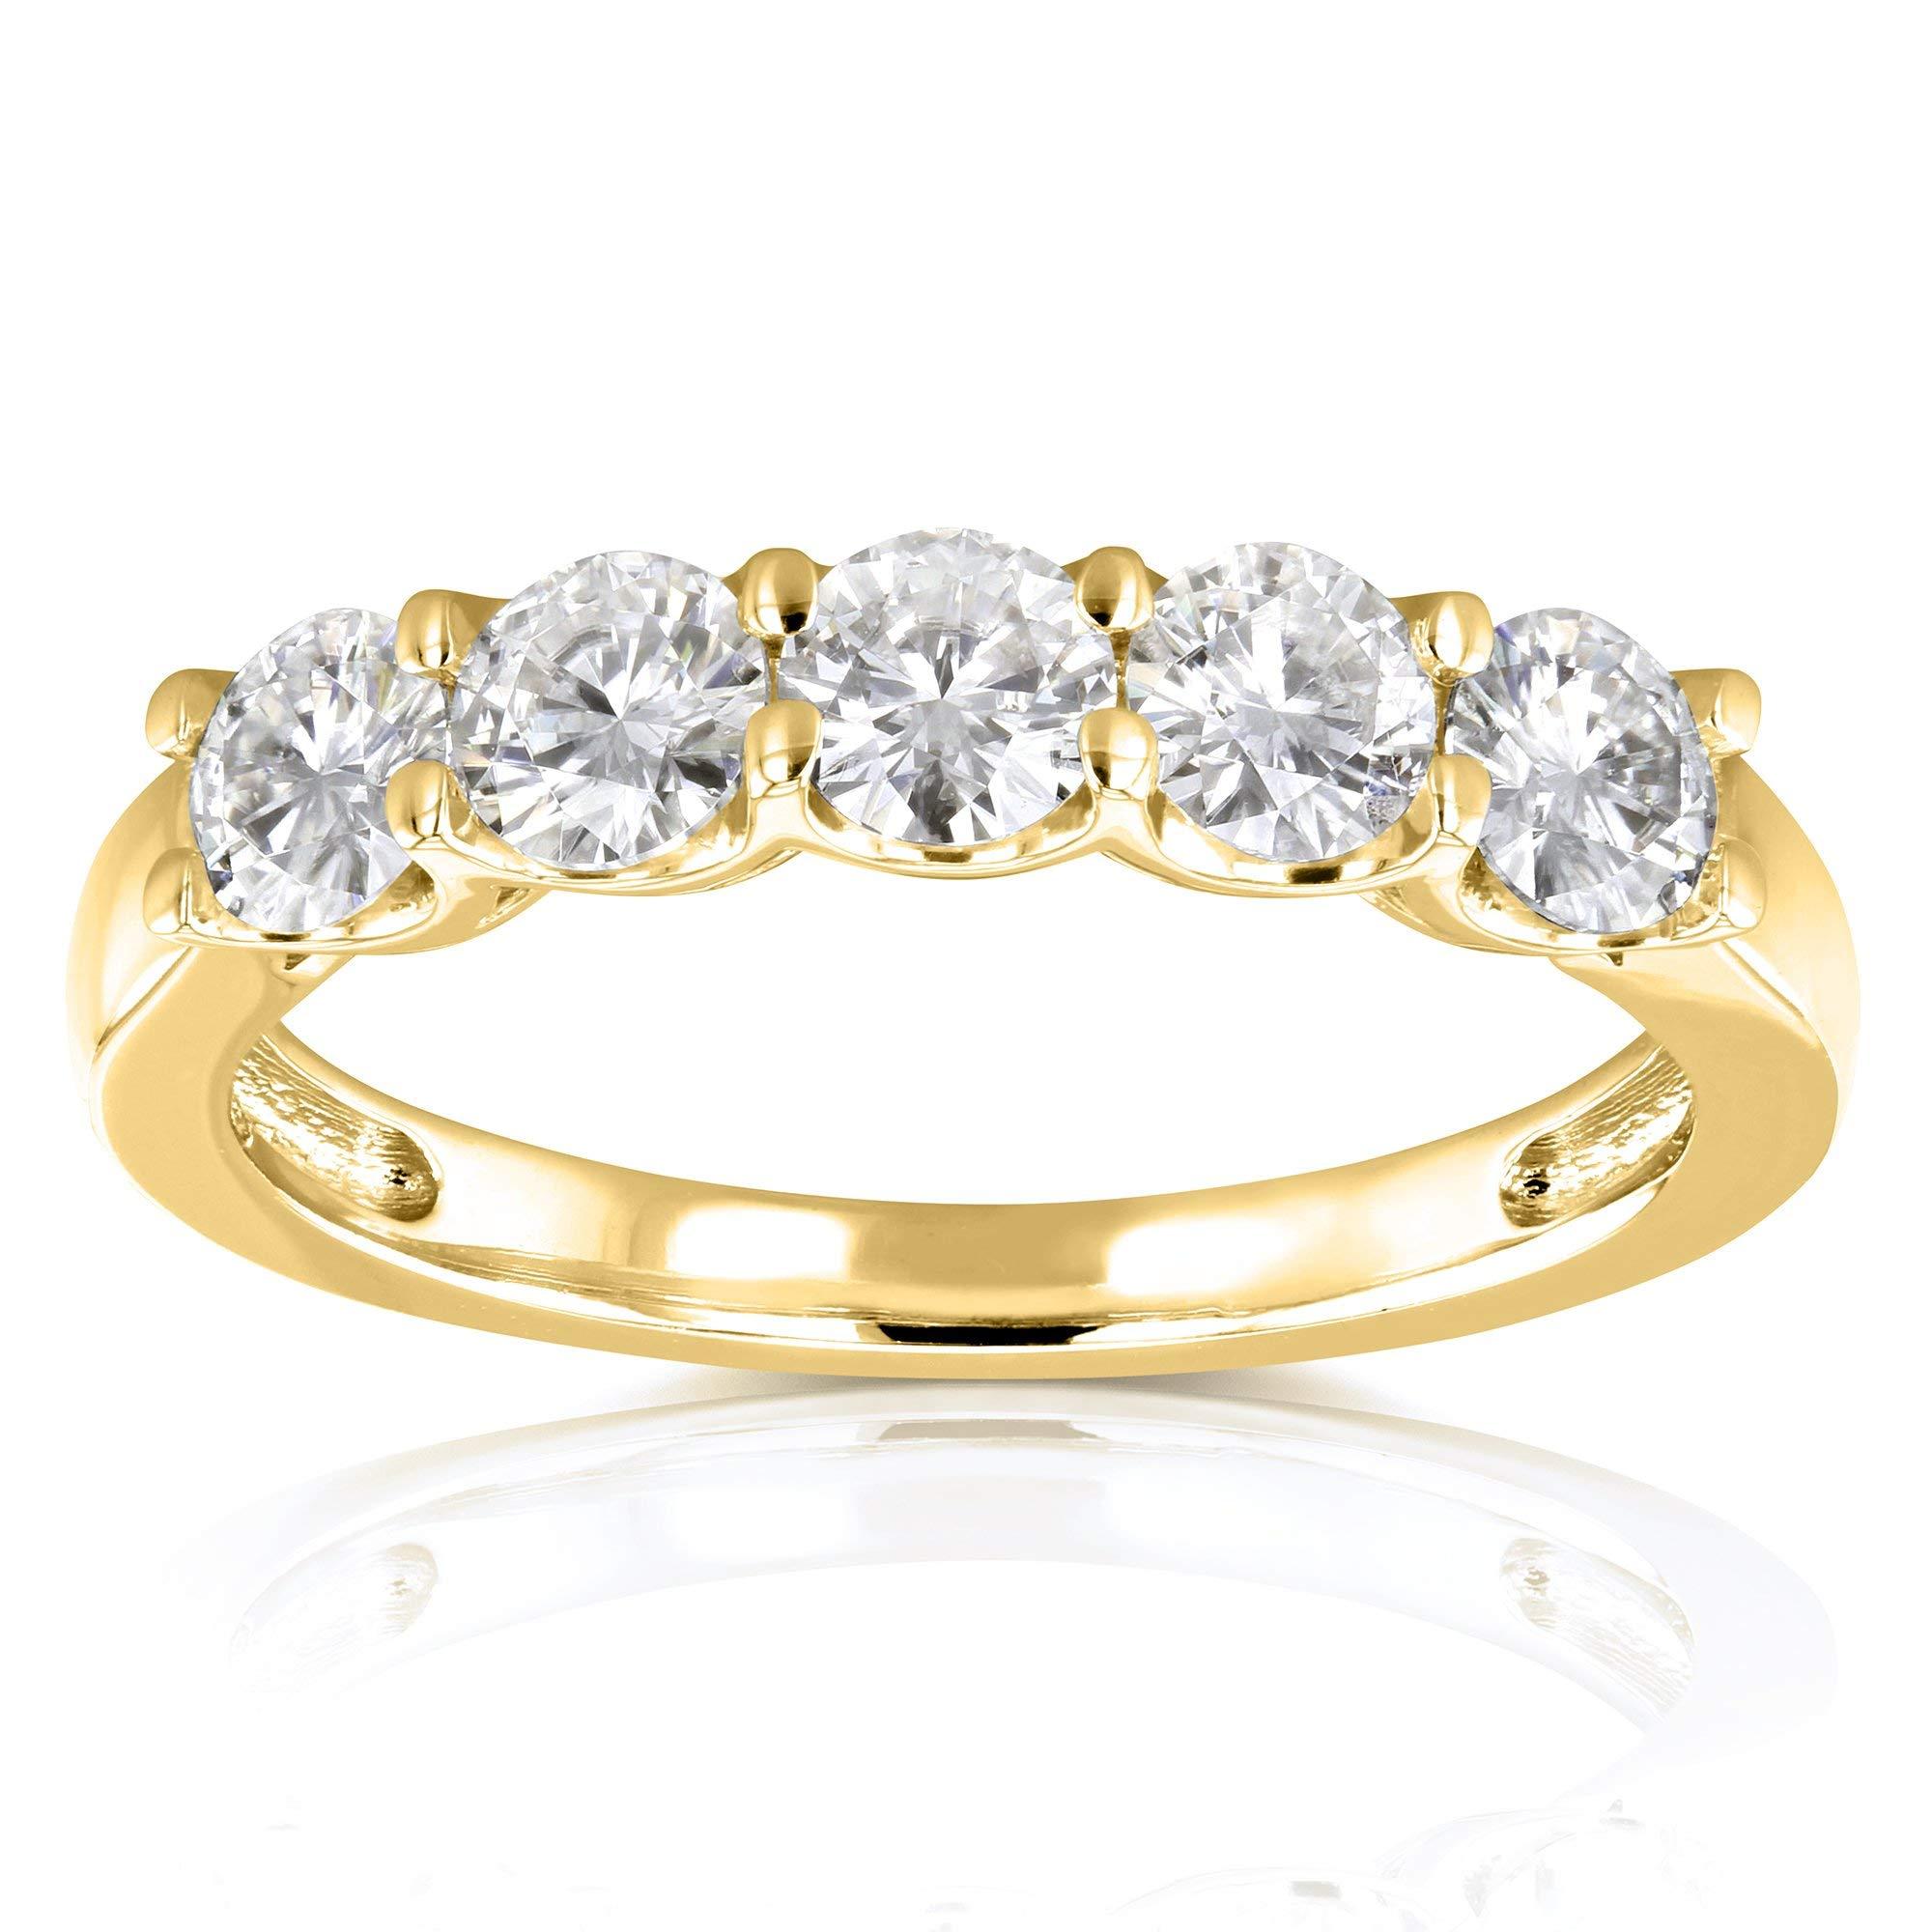 Kobelli Five Stone 4/5 Carat TGW Round Brilliant Near Colorless Moissanite (HI) Bridal Wedding Band in 14k Yellow Gold - Size 10 by Kobelli